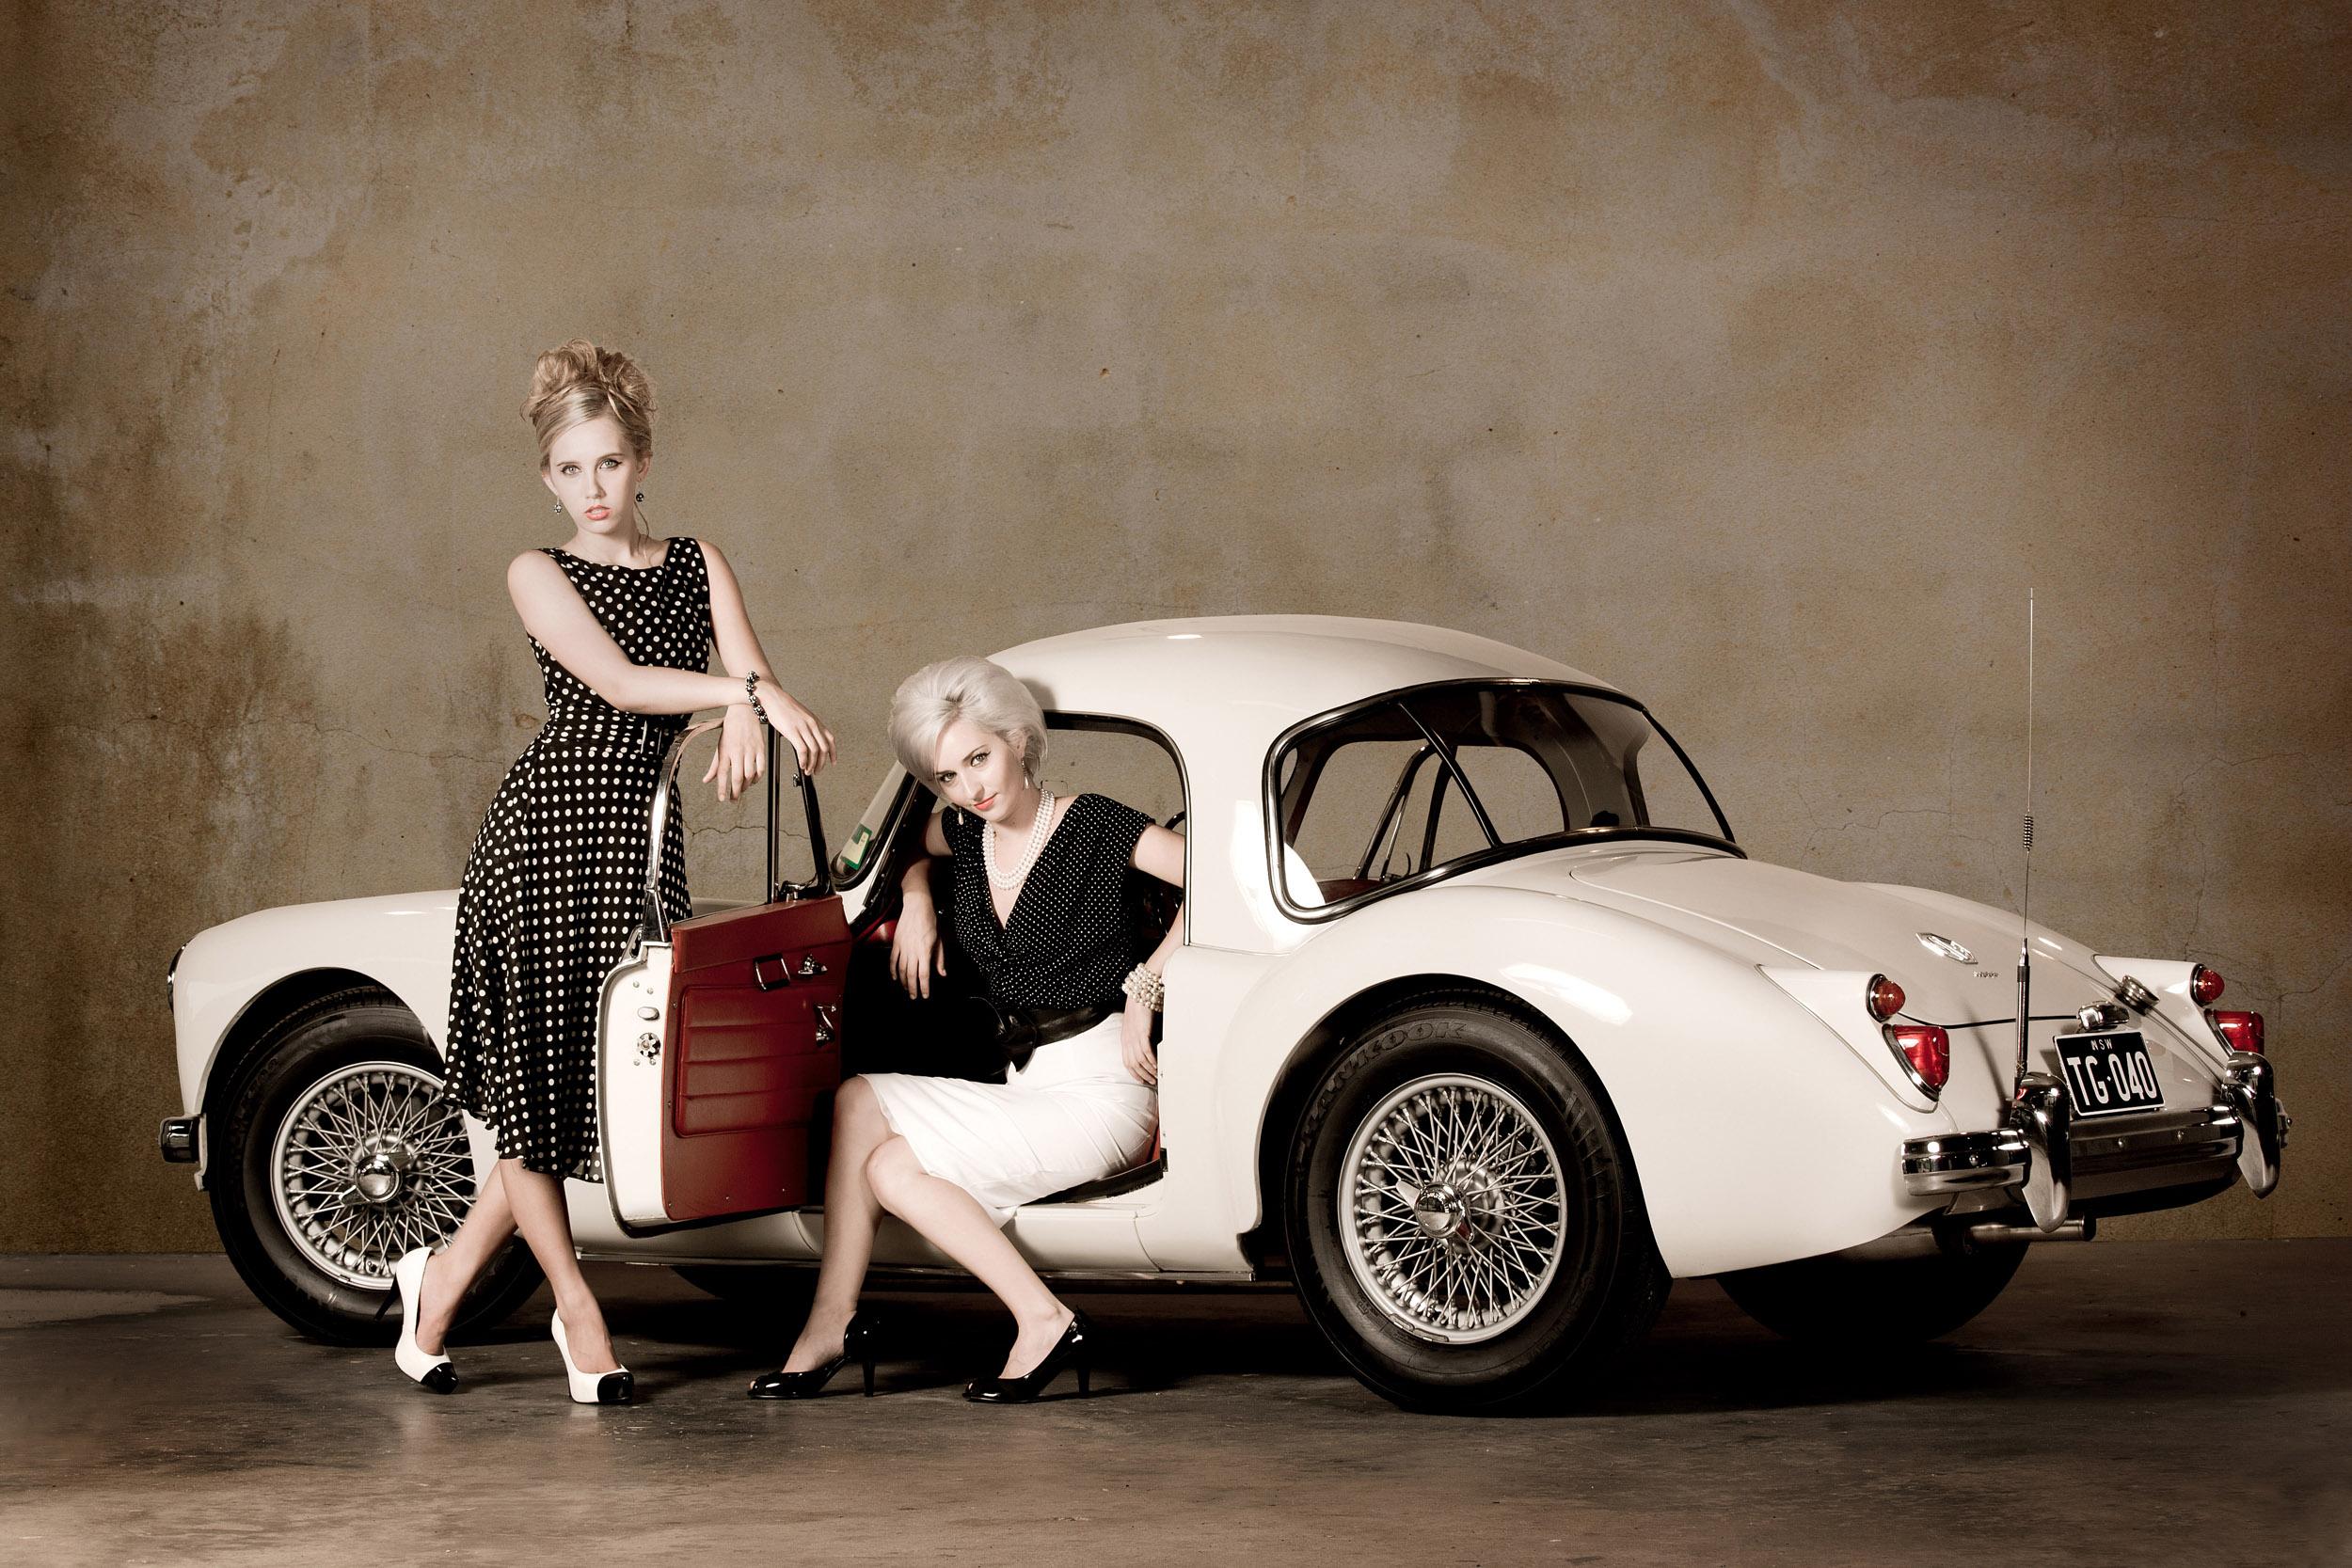 styled-model-photoshoot-mg-car-fashion.jpg